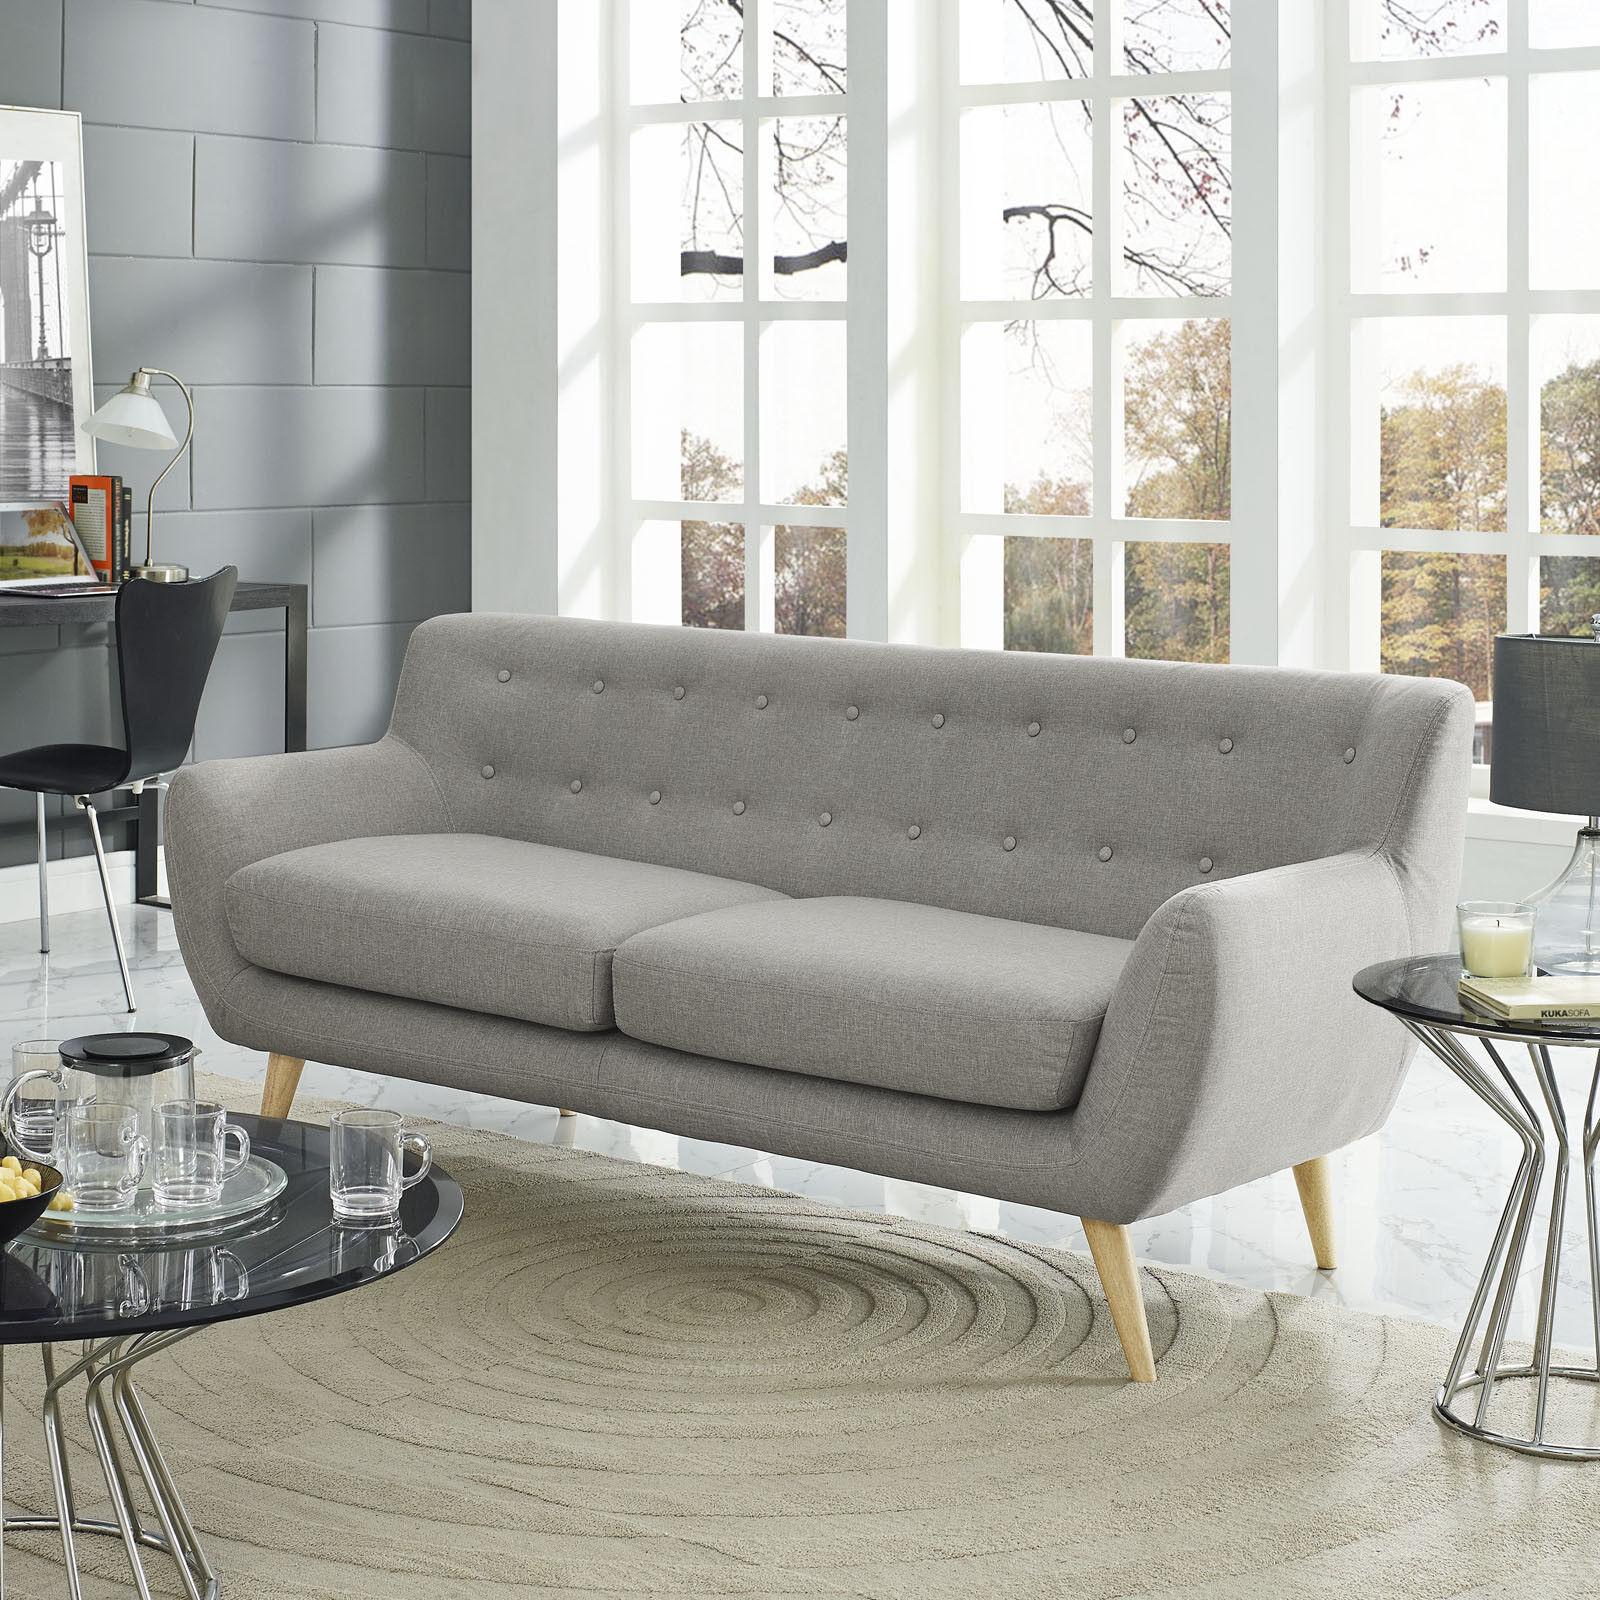 Mid-Century Modern Tufted Light Gray Upholstered Fabric Living ...